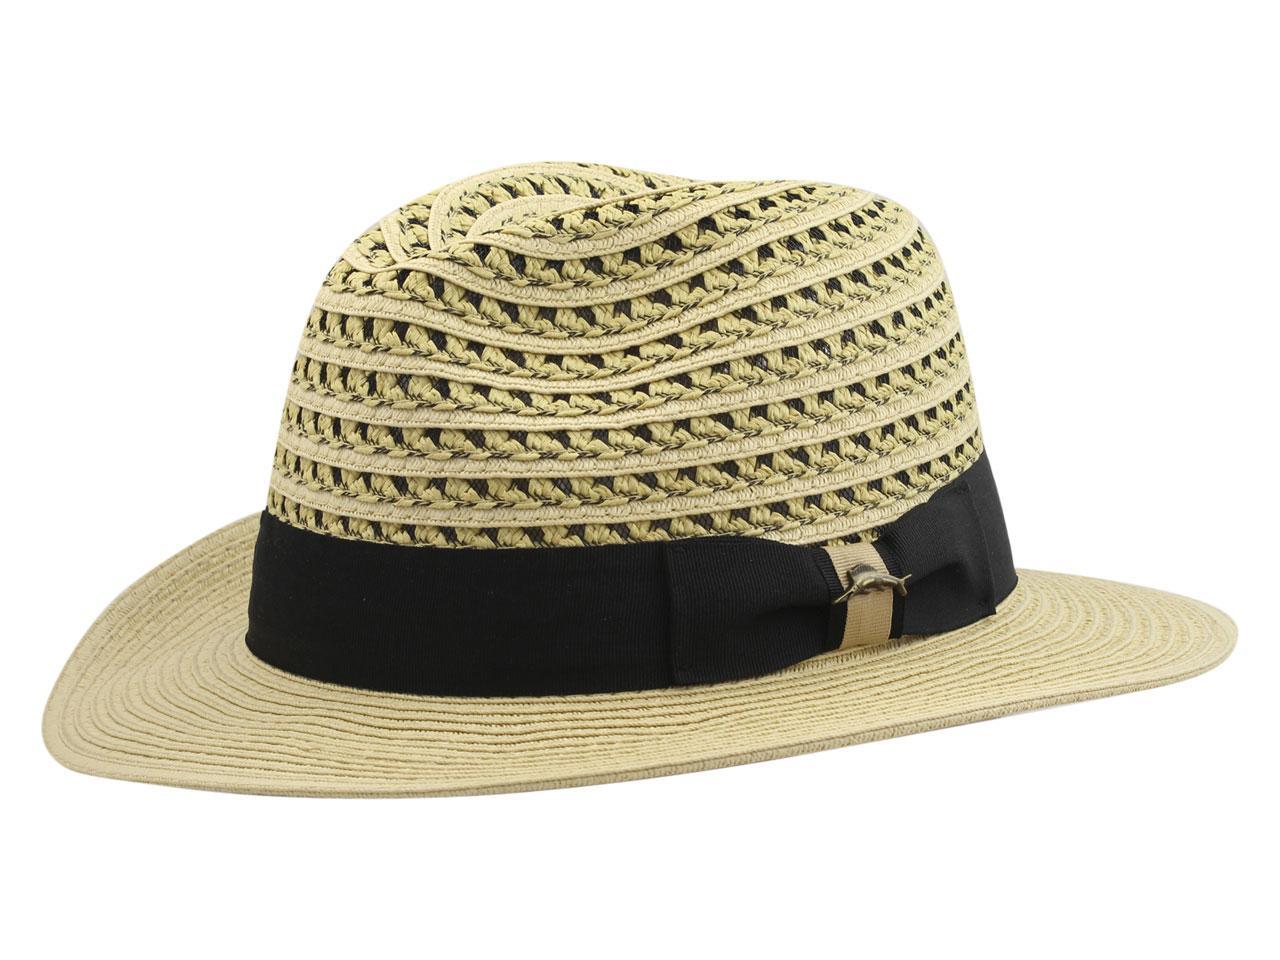 Image of Tommy Bahama Men's Two Tone Safari Hat - Beige - Large/X Large